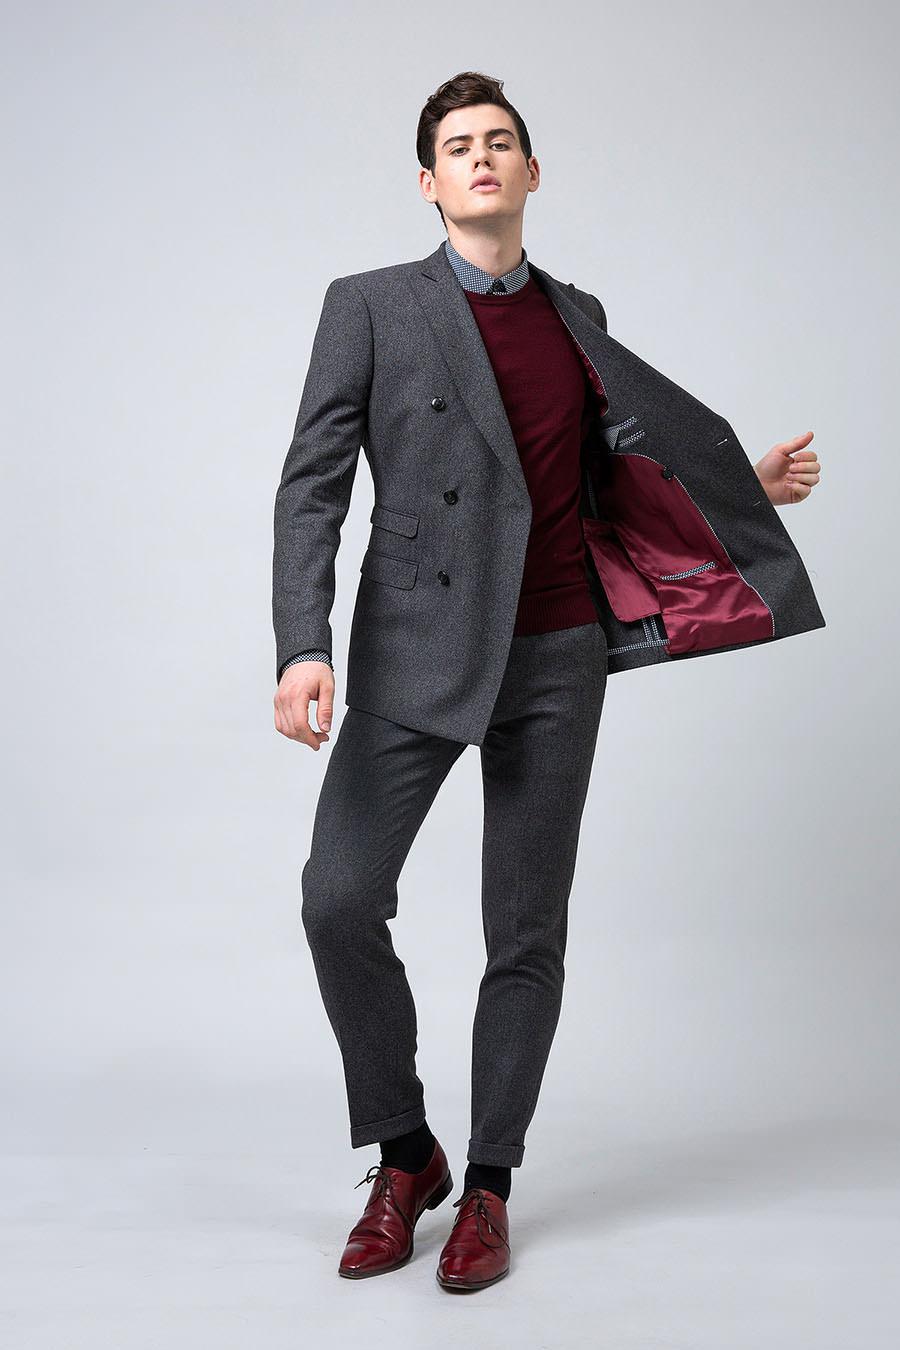 samonsurmesureH16 costume croise gris-2